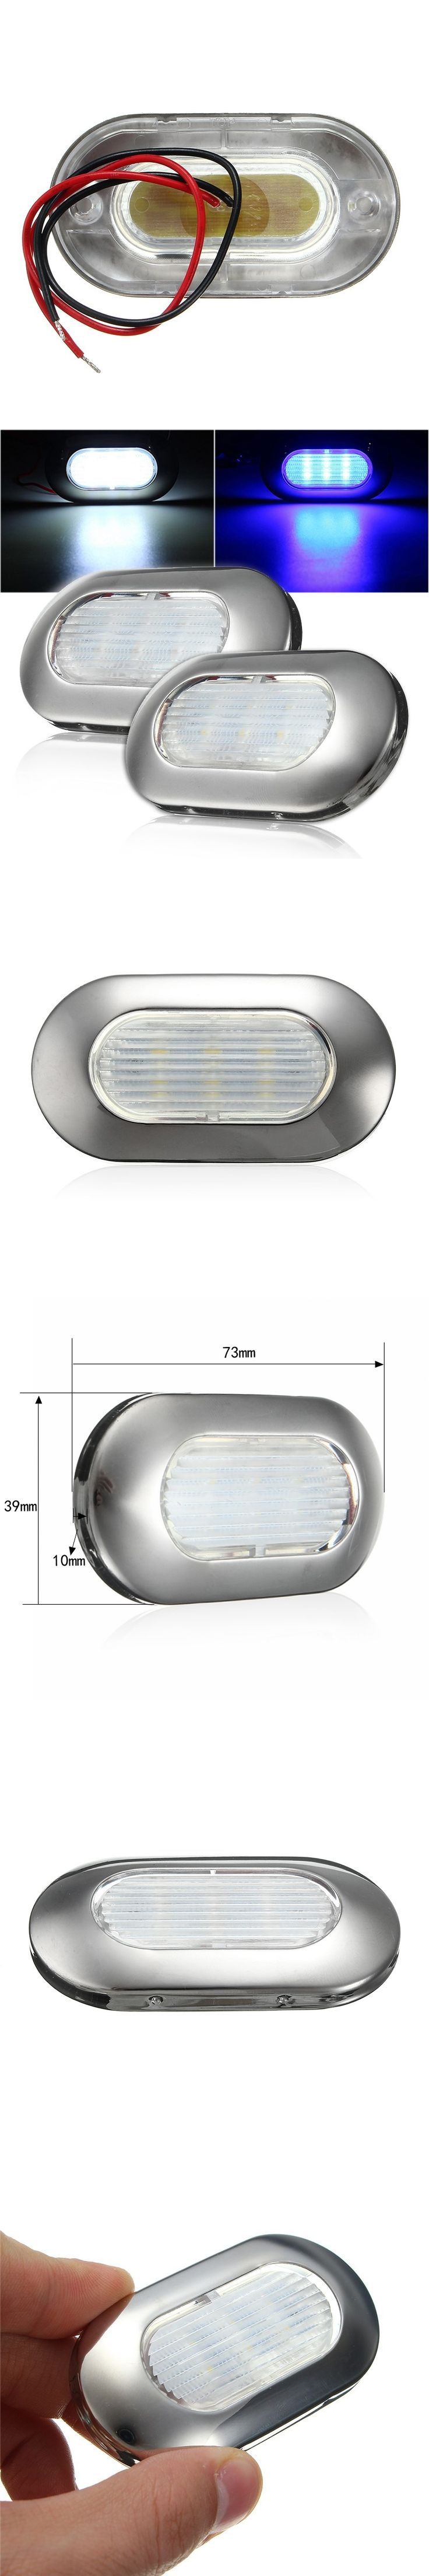 2835 Marine Ship Lights Yacht LED Light 12V White/Blue Waterproof Stainless Steel Led Boat Navigation Lights